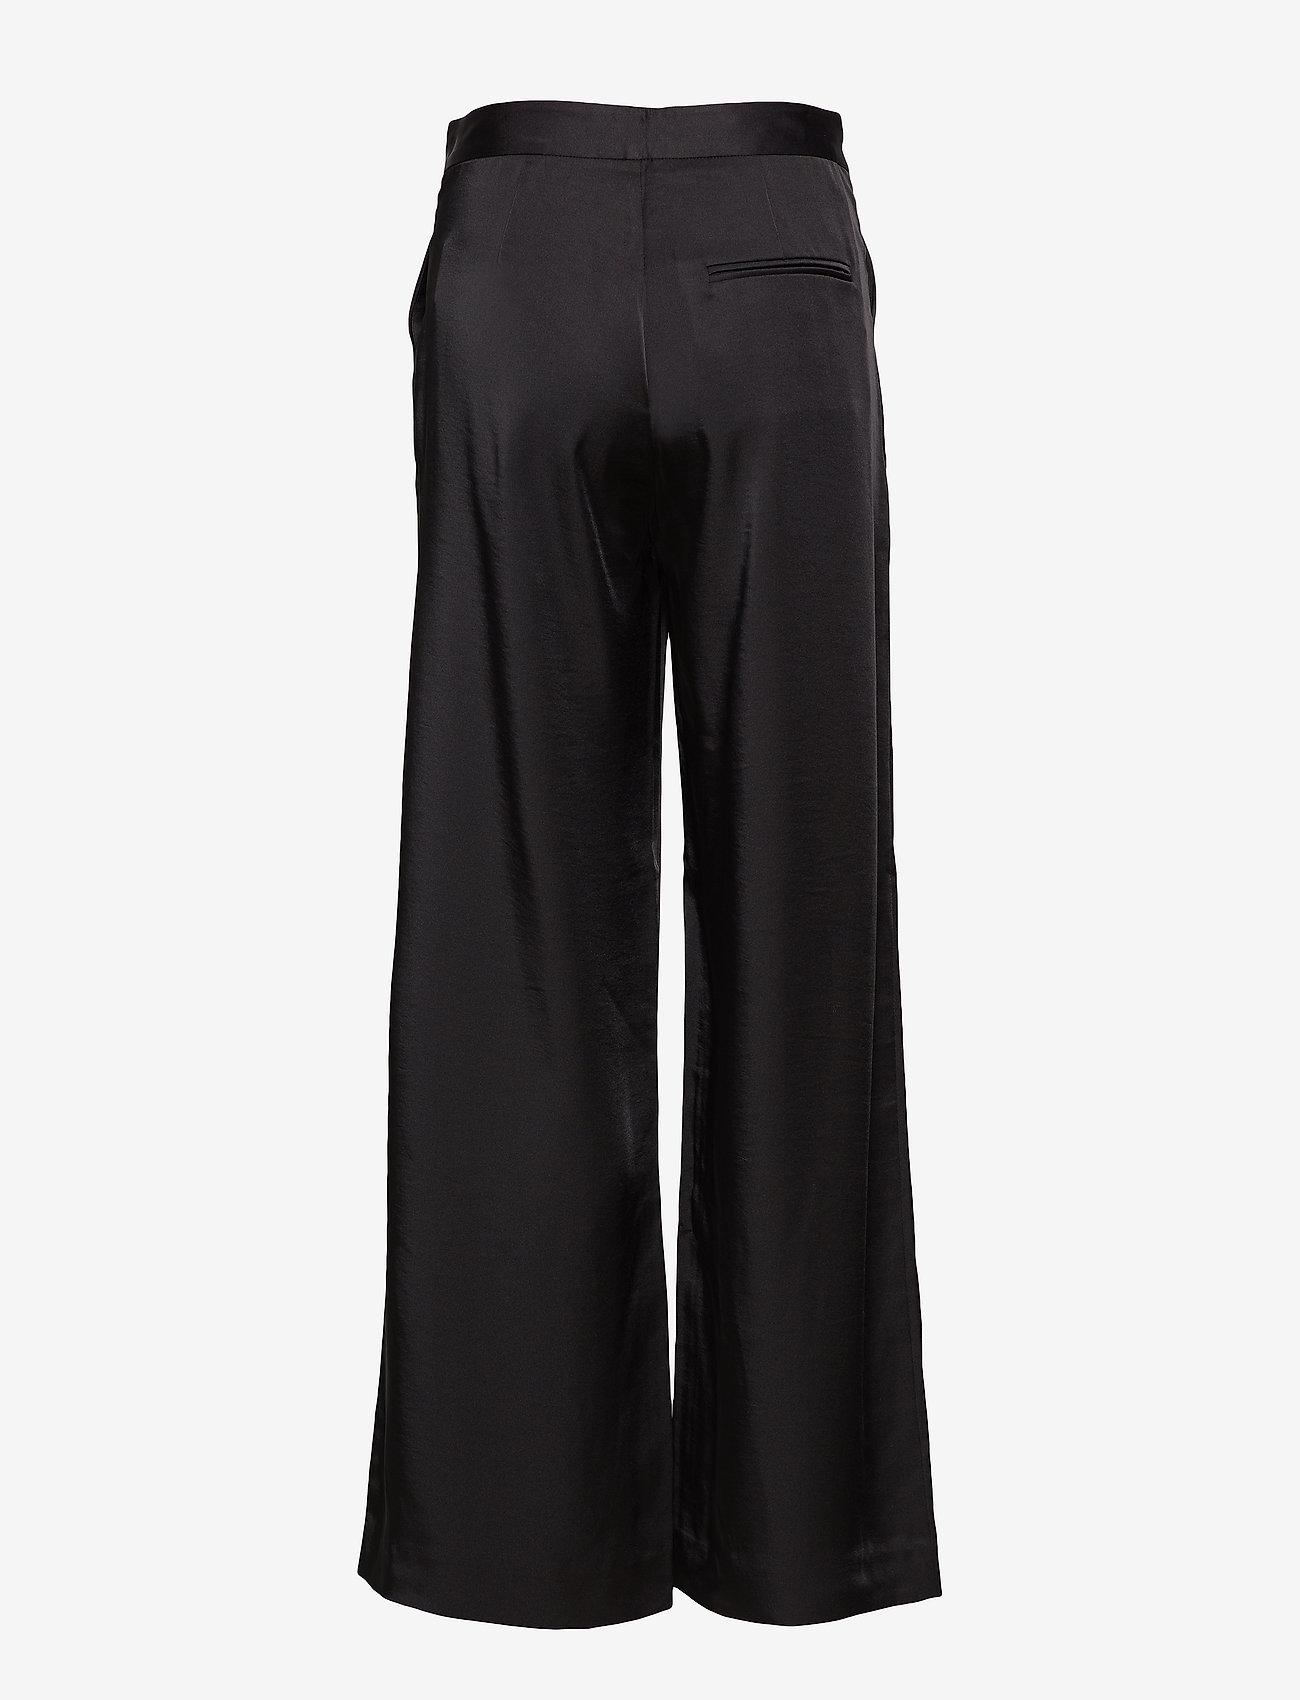 2NDDAY - 2ND Duffy - wide leg trousers - black - 1